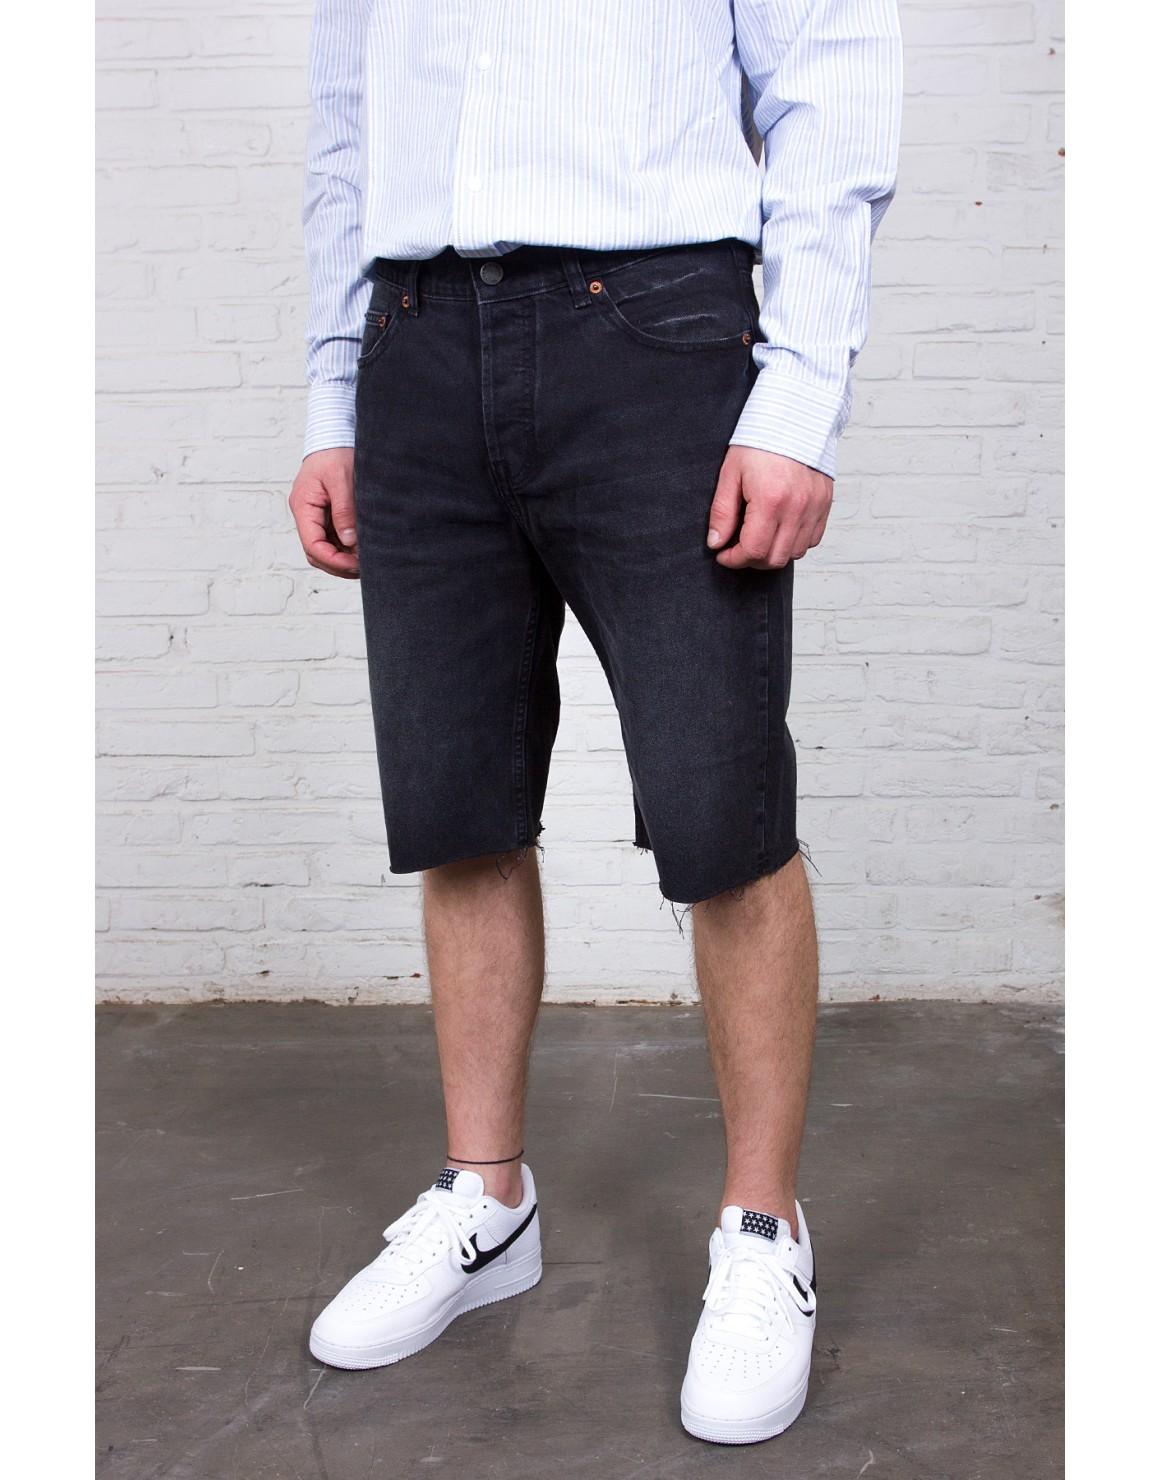 Beat Shorts